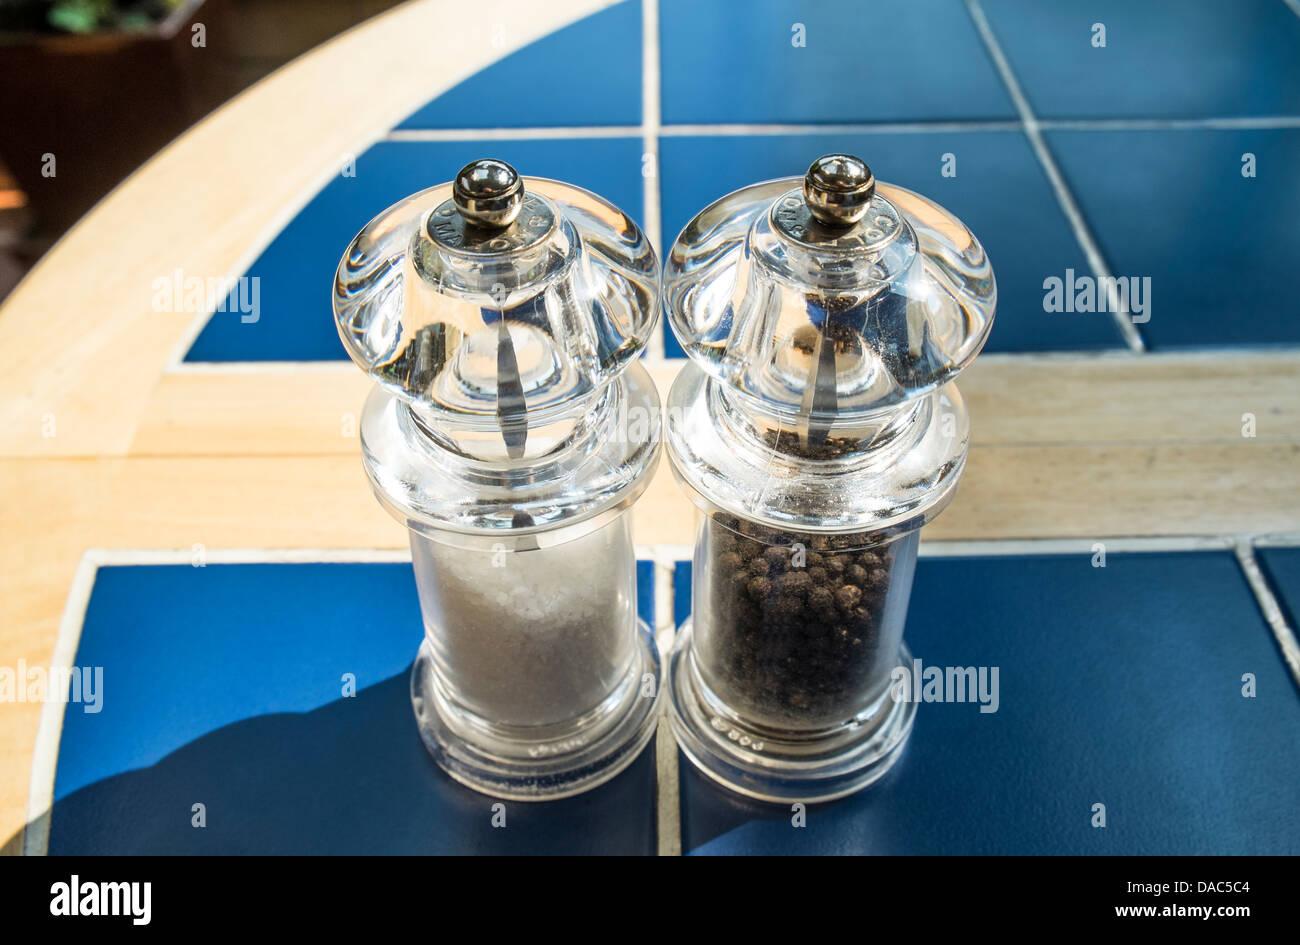 Salt and pepper mills, grinders - Stock Image